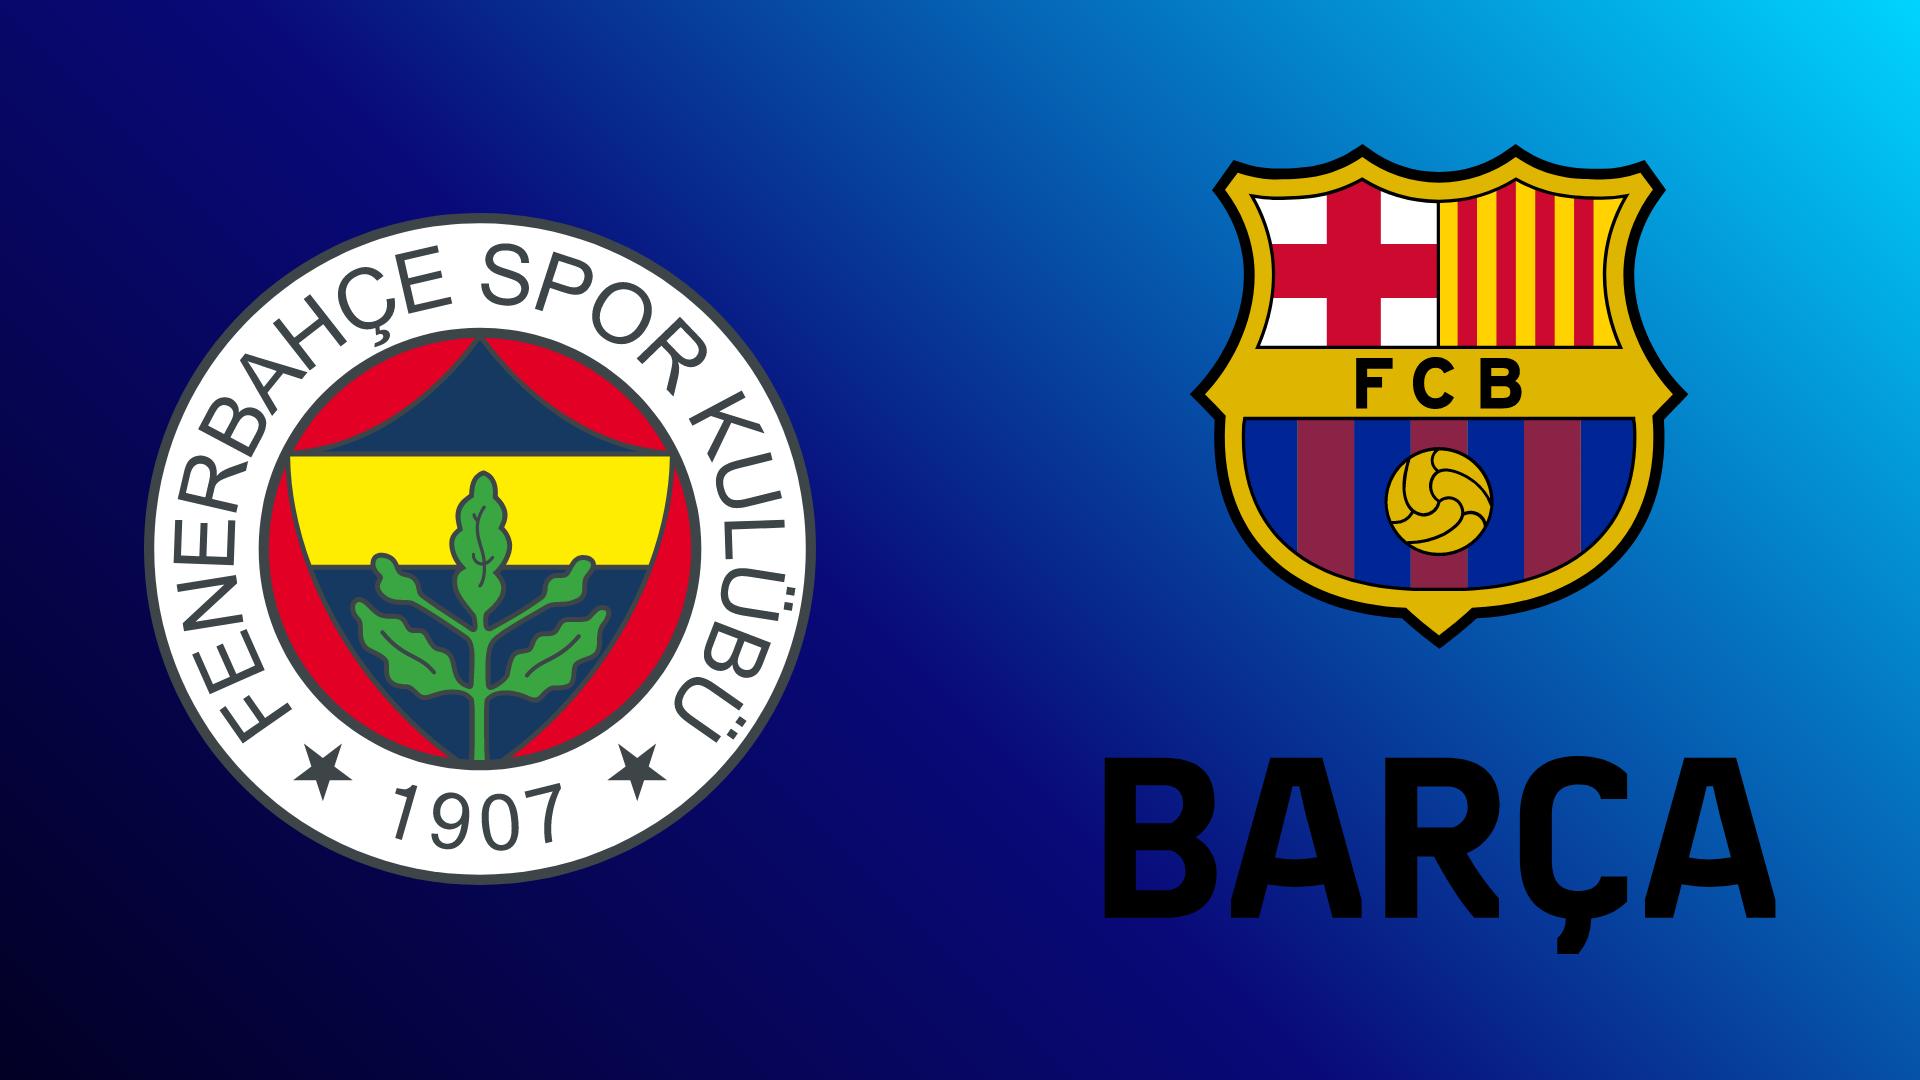 Fenerbahce Beko Istanbul - FC Barcelona 26.10.2021 um 19:30 Uhr auf Magenta Sport